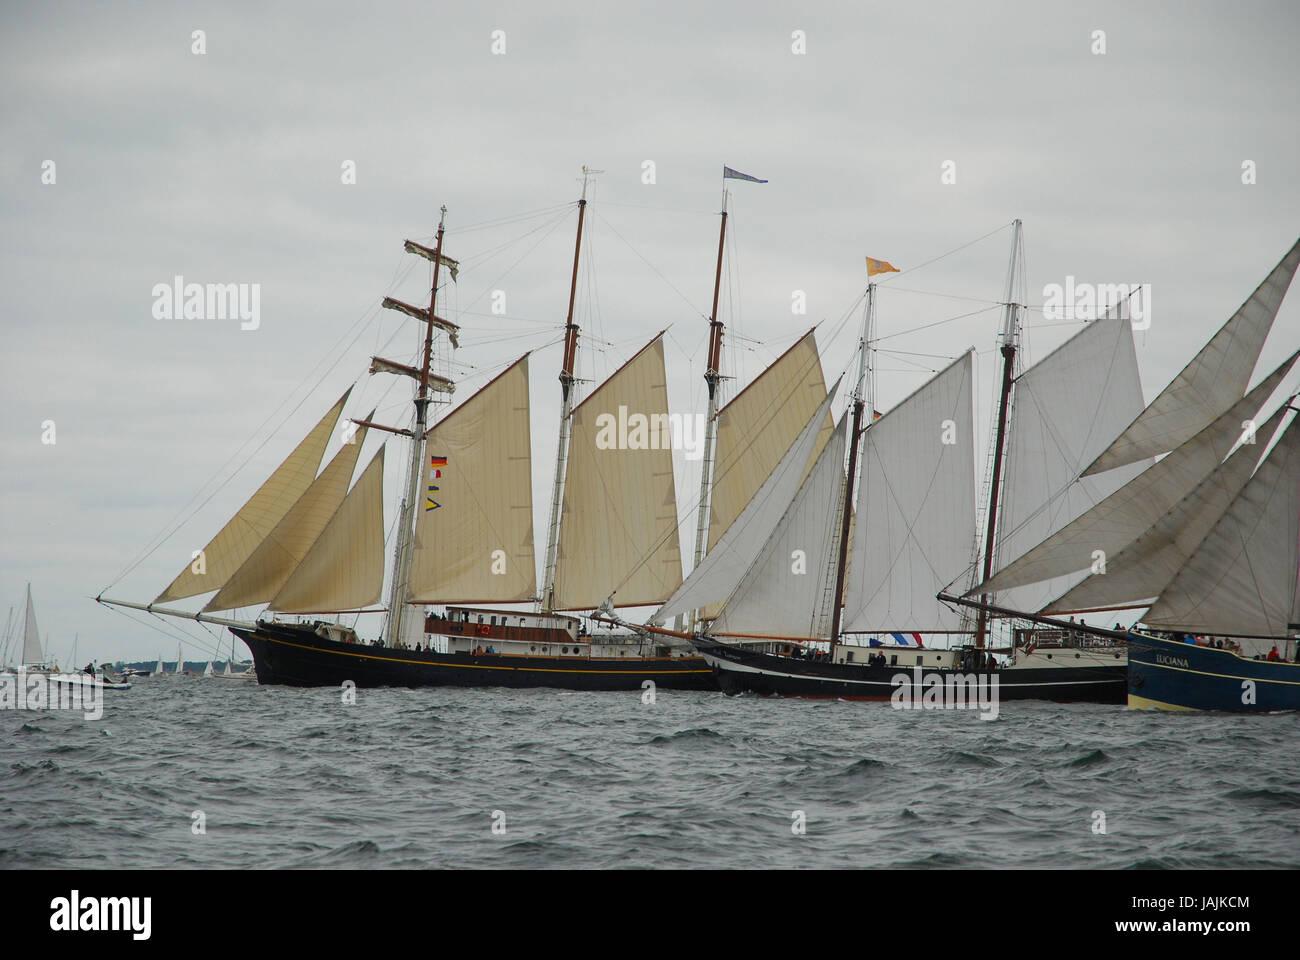 Germany,Schleswig - Holstein,Kiel,Kiel Förde,sailing ships,ship save, - Stock Image